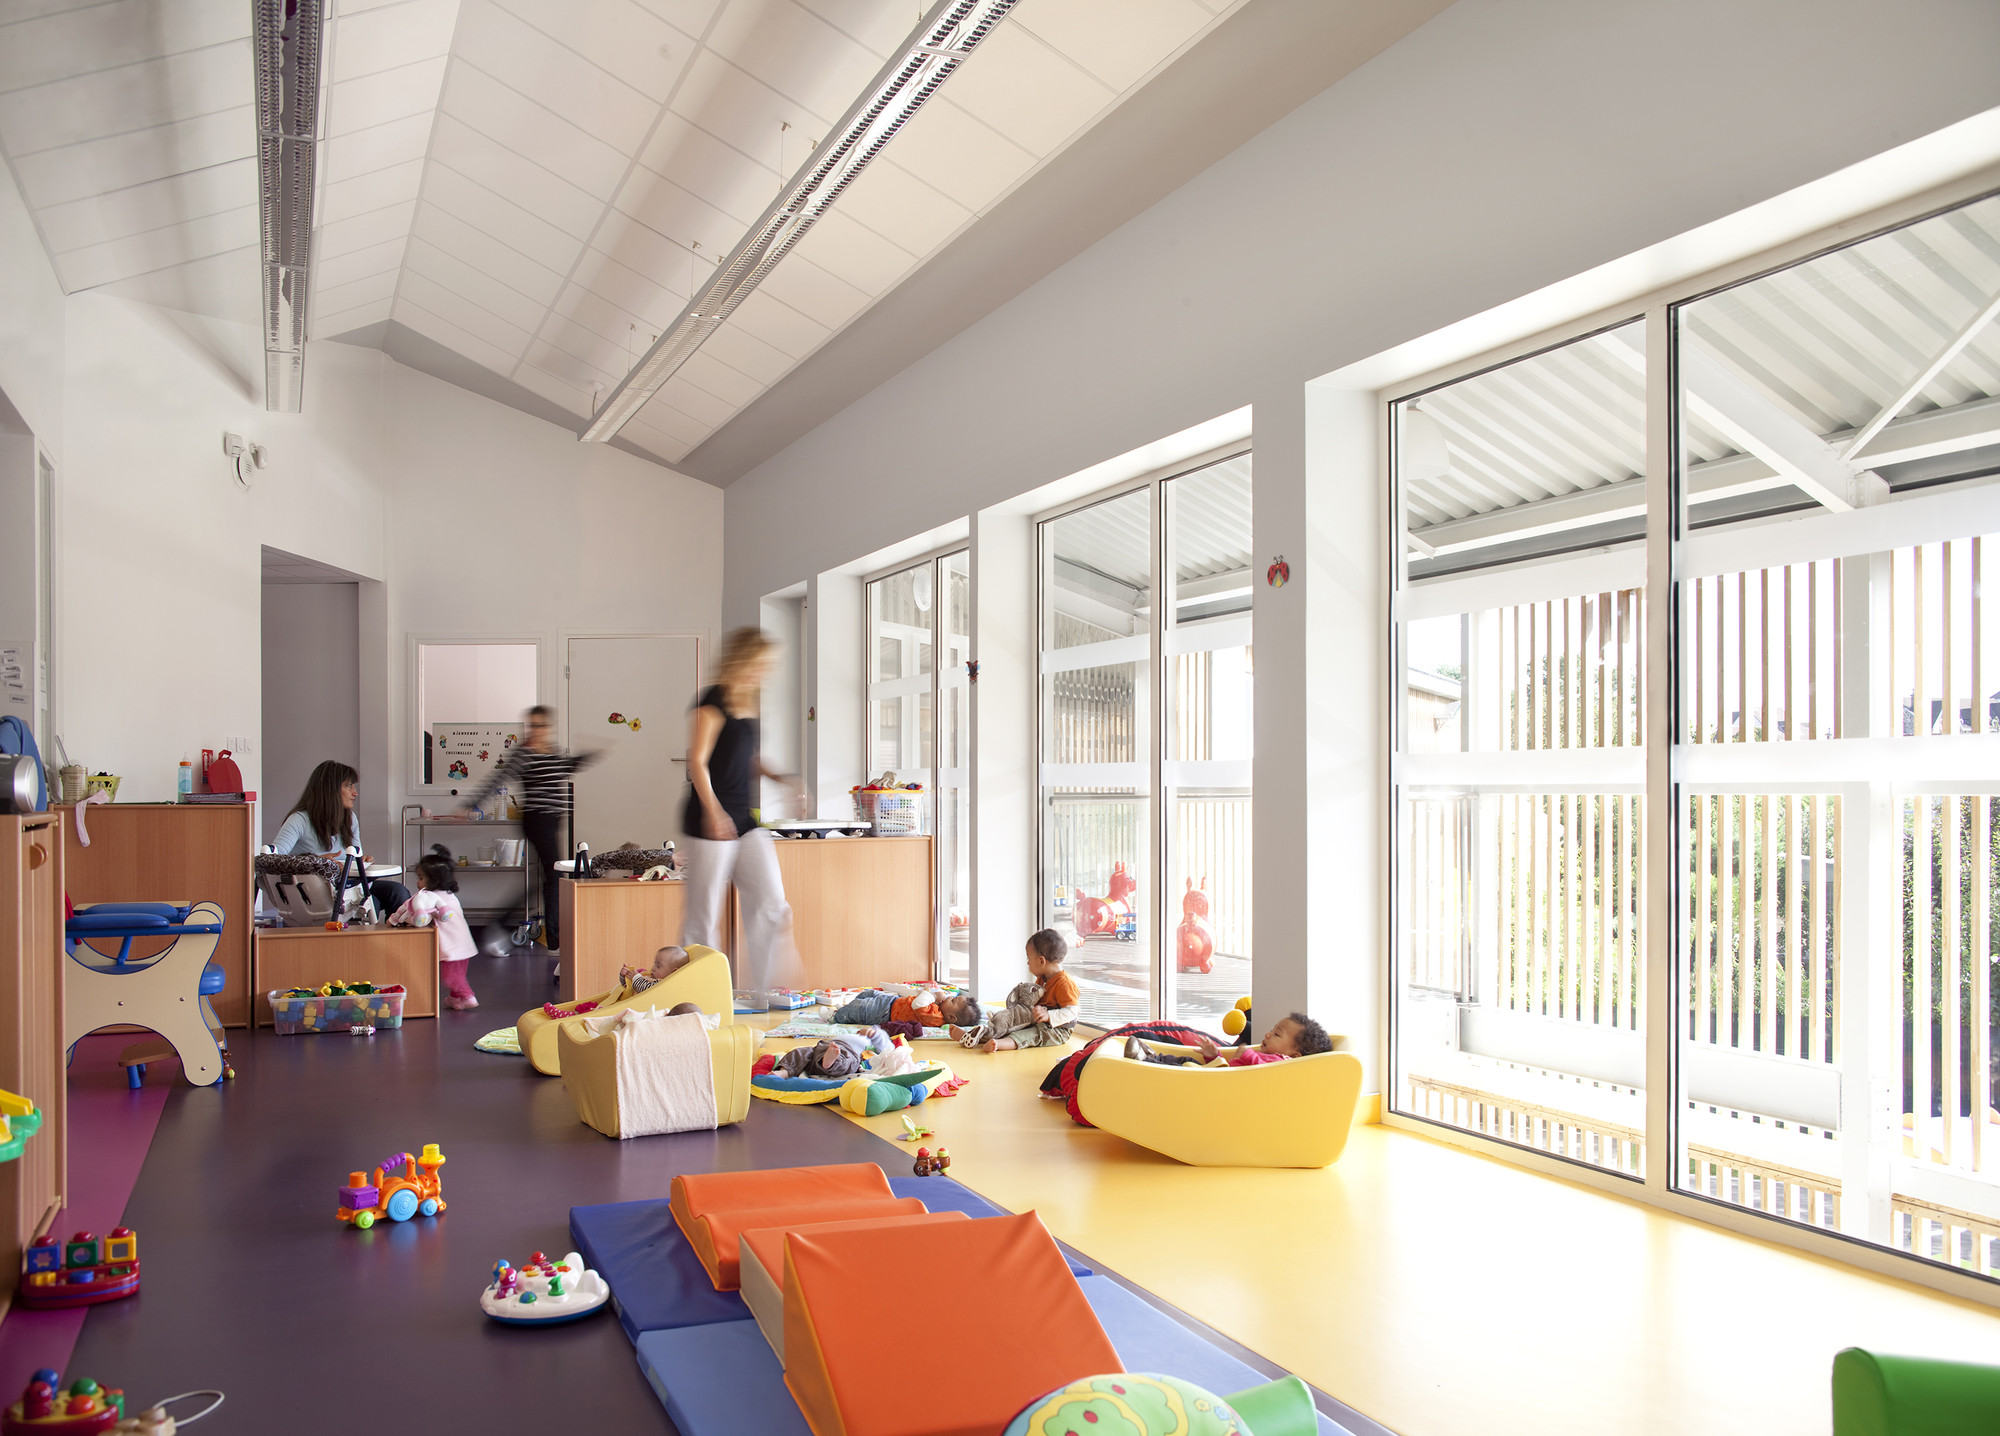 Best Interior Design Schools In Italy